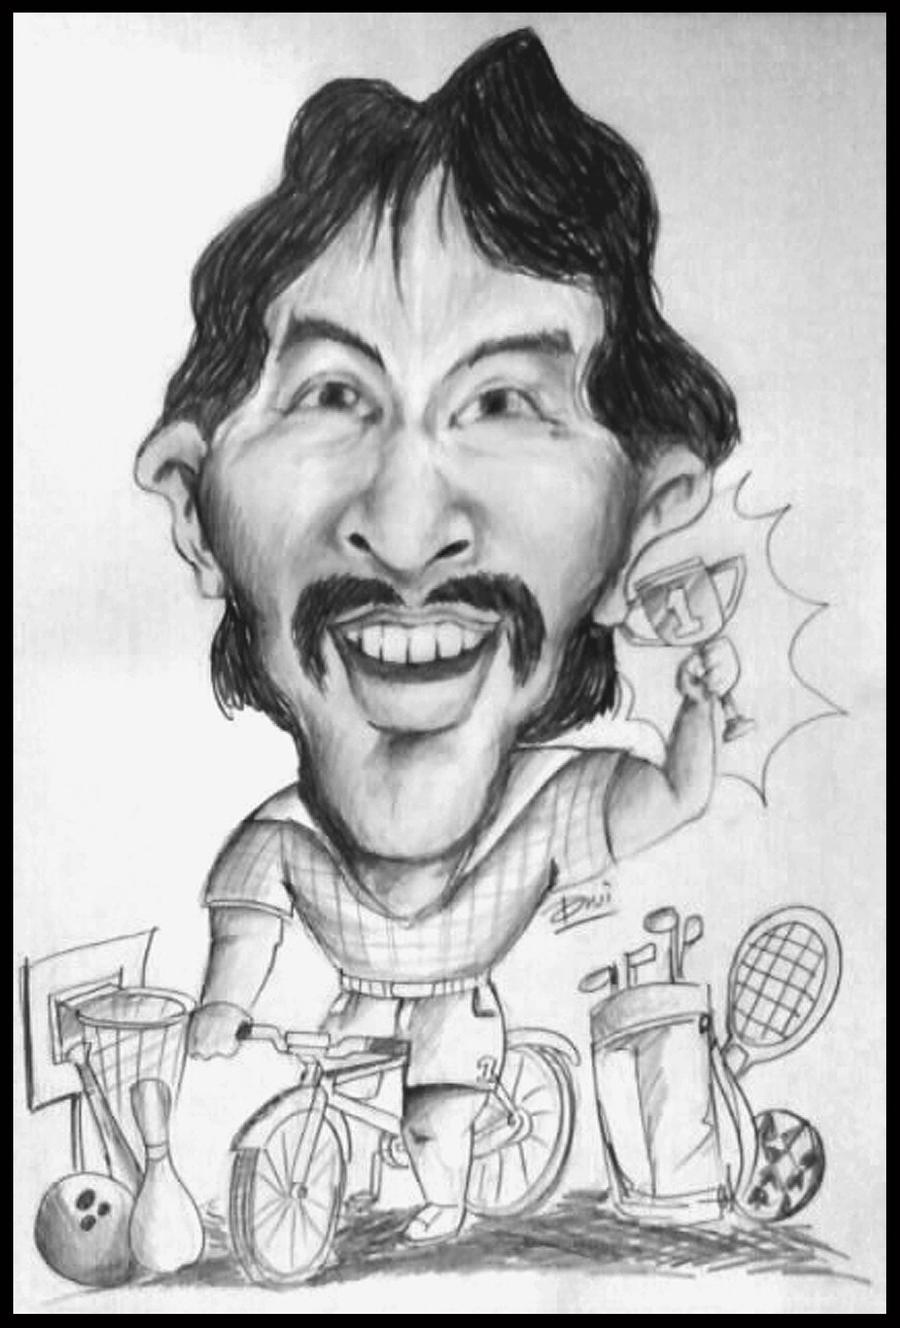 andi malarangeng karikatur 1 by gondz